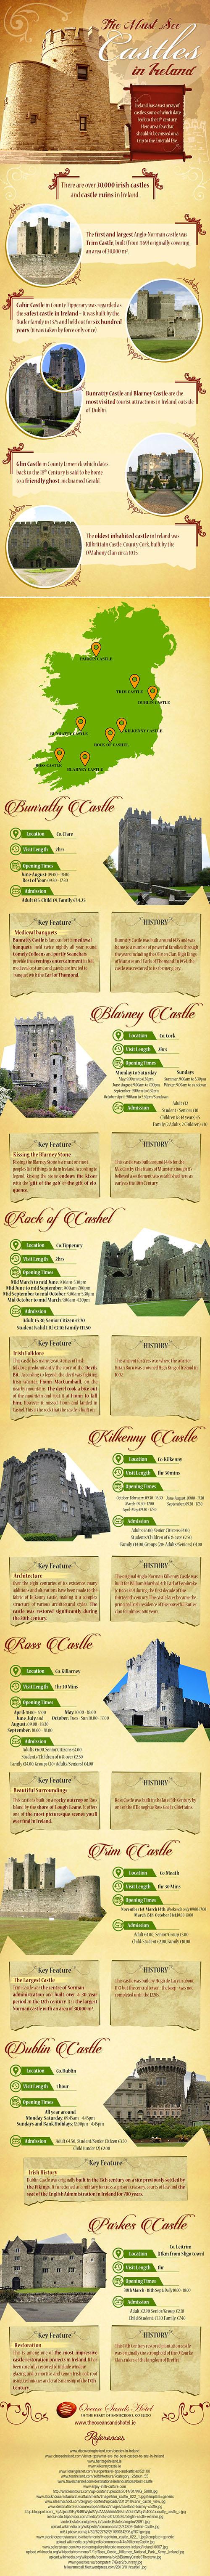 Must see castles in Ireland